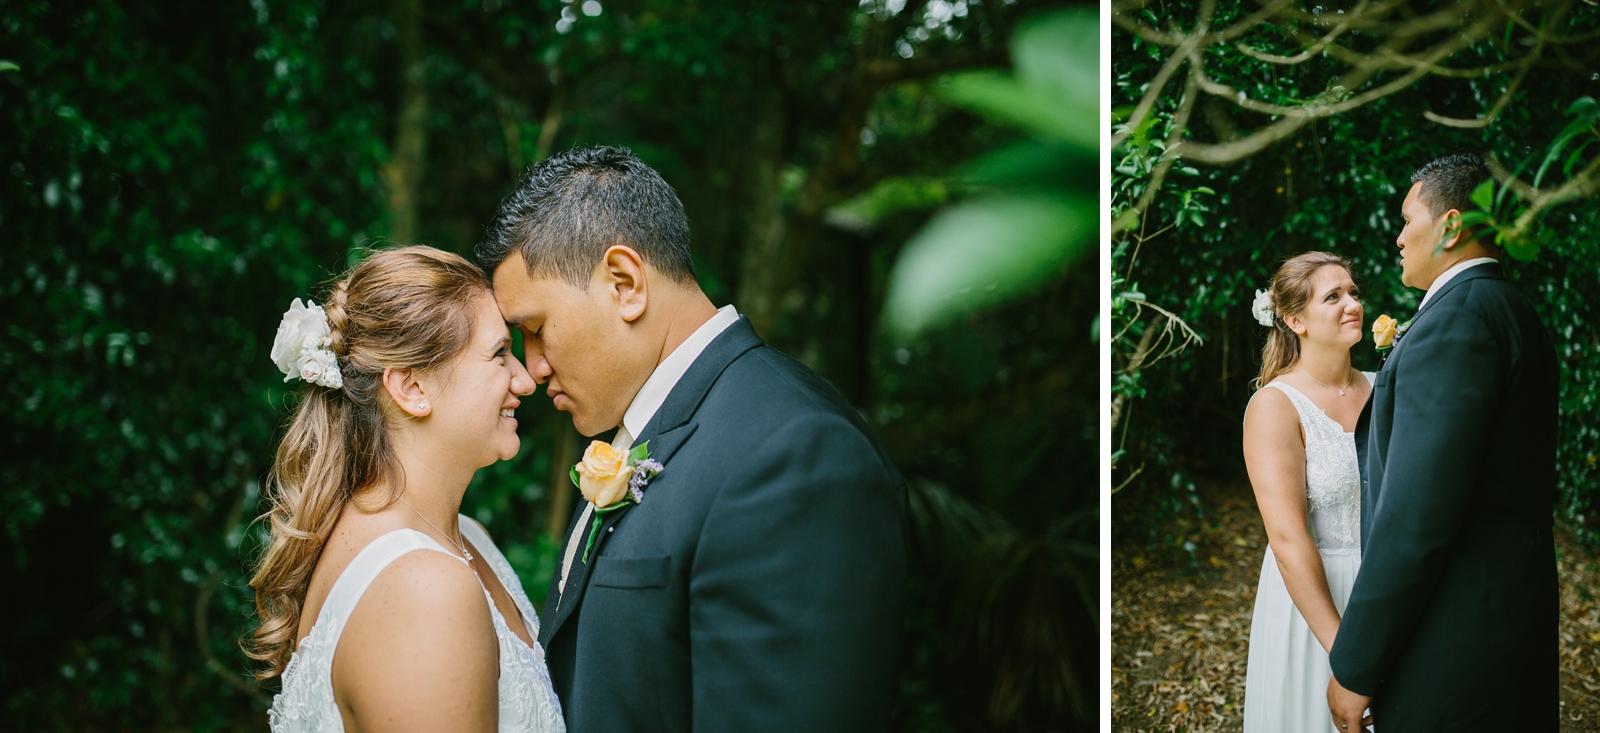 GabbyFiti_Auckland Wedding Photographer_Patty Lagera_0066.jpg